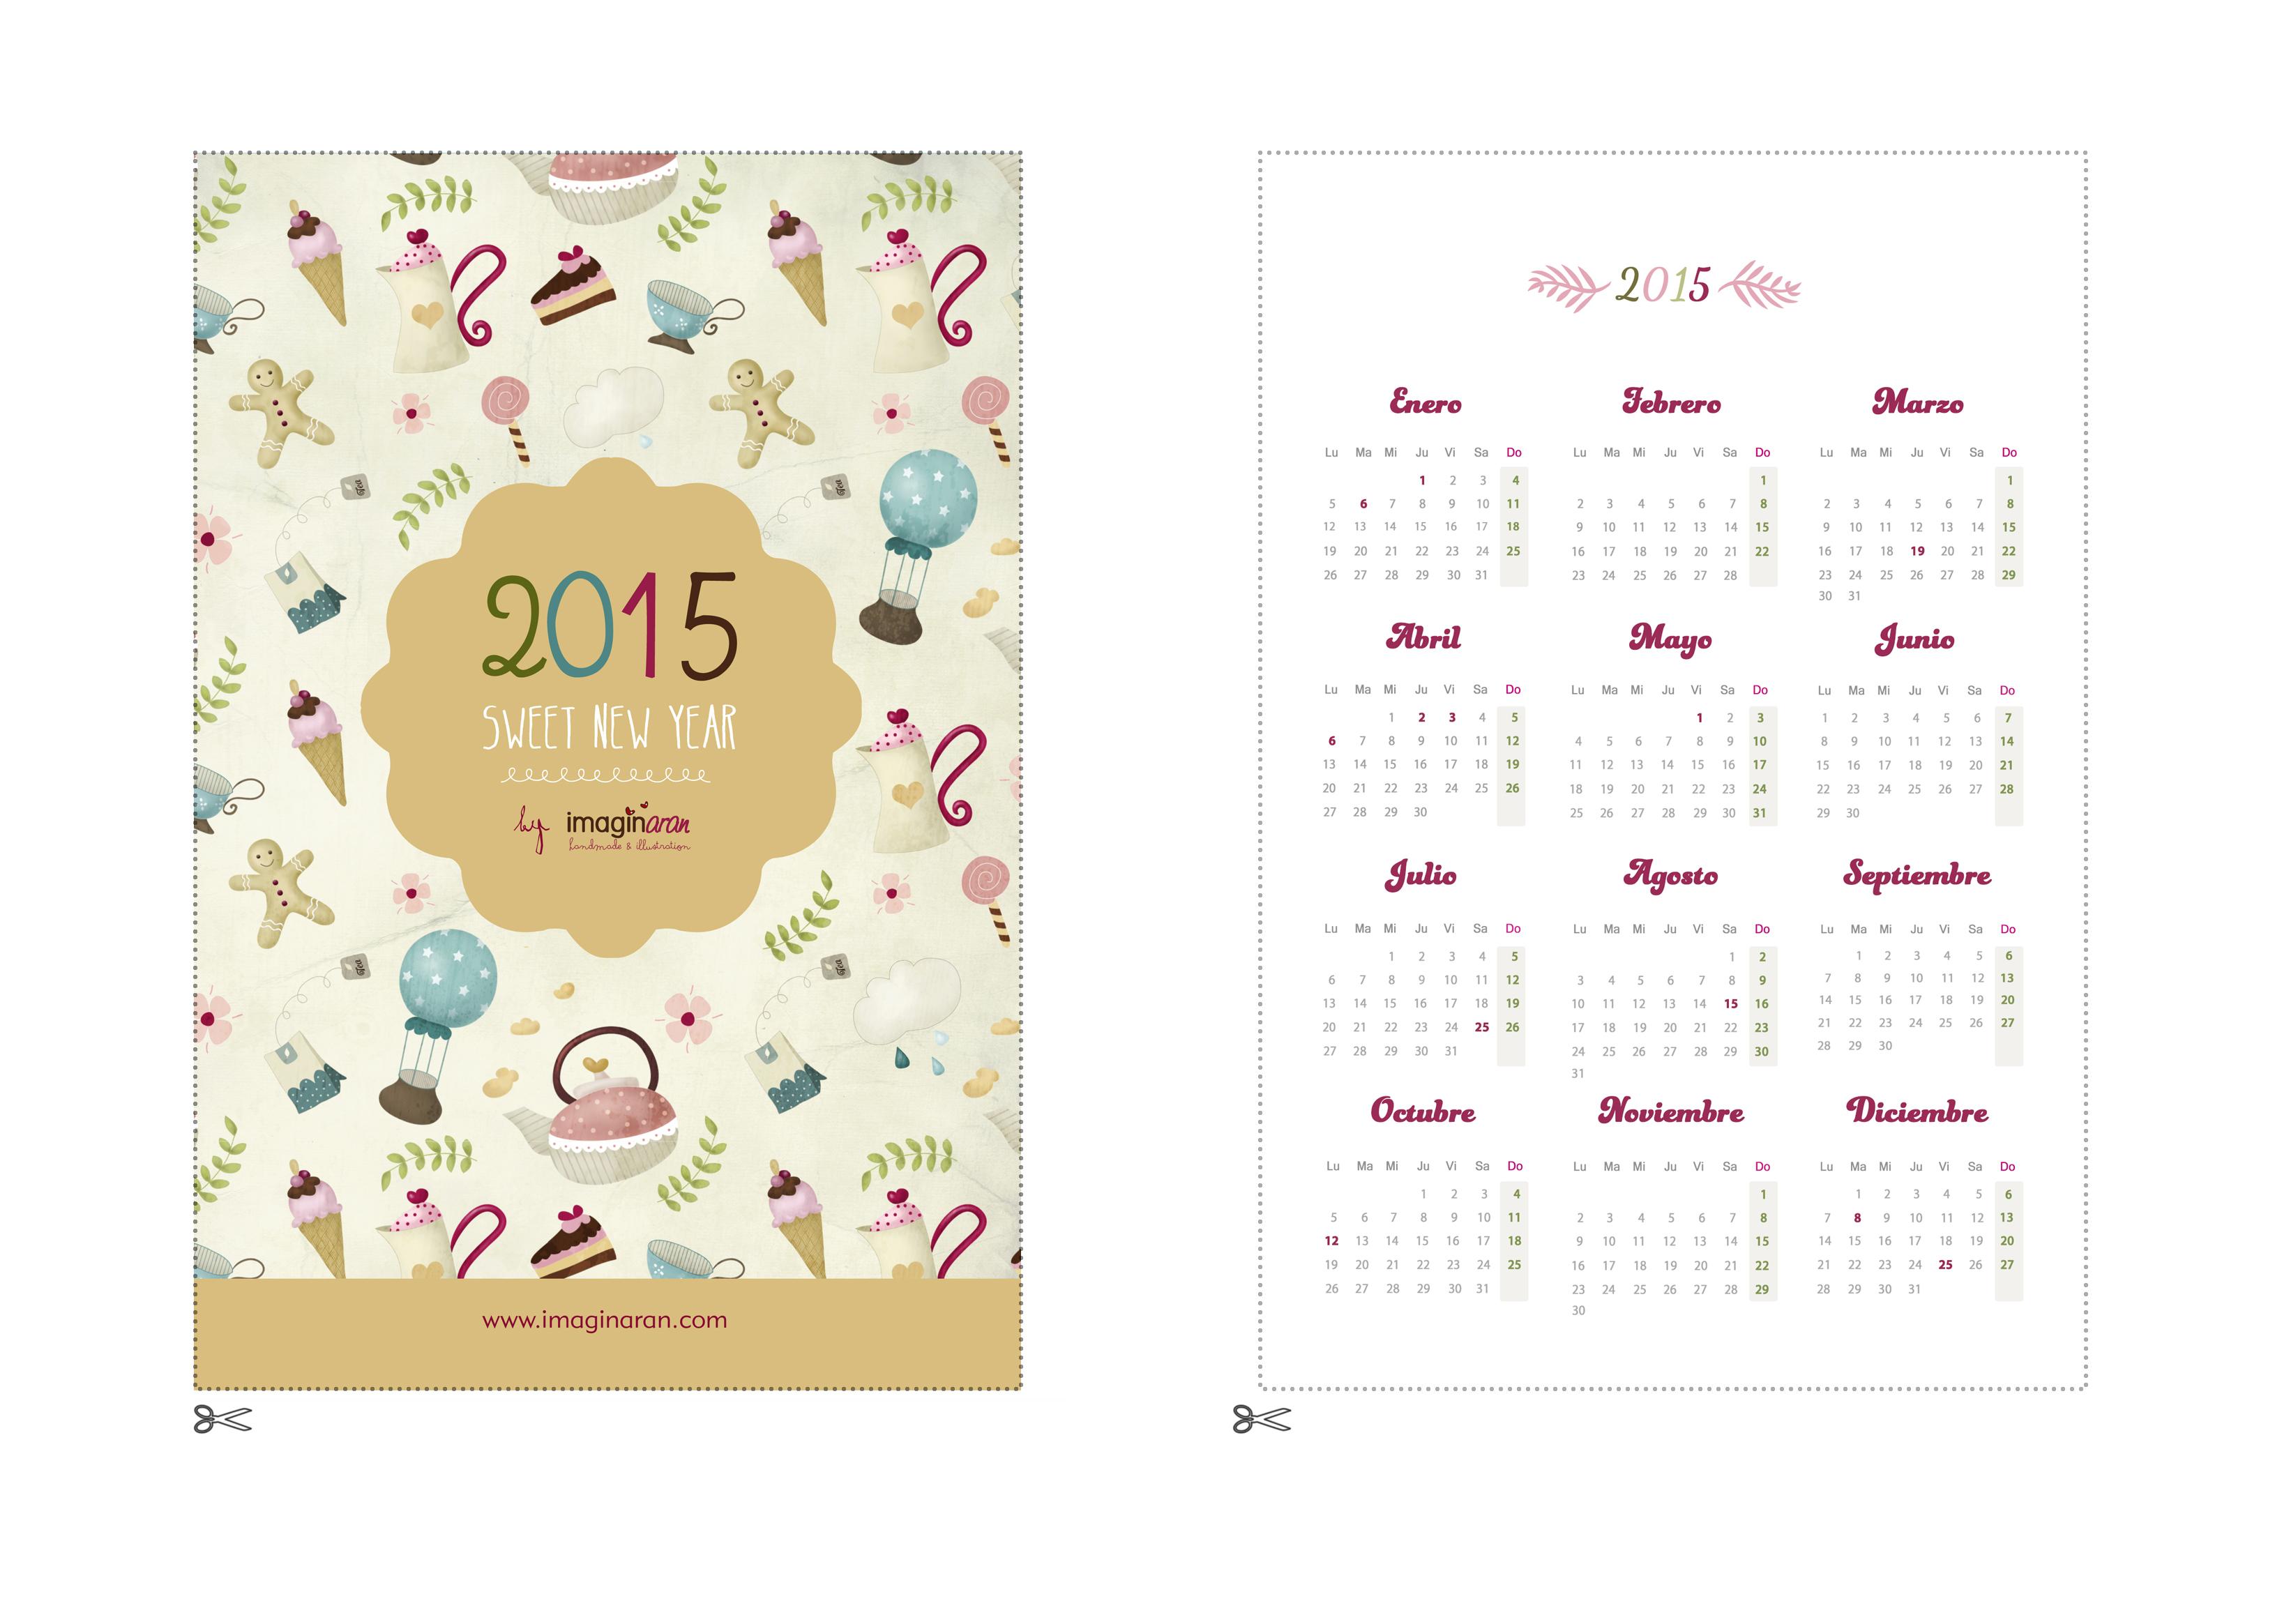 calendario-imaginaran-diy-2013.psd